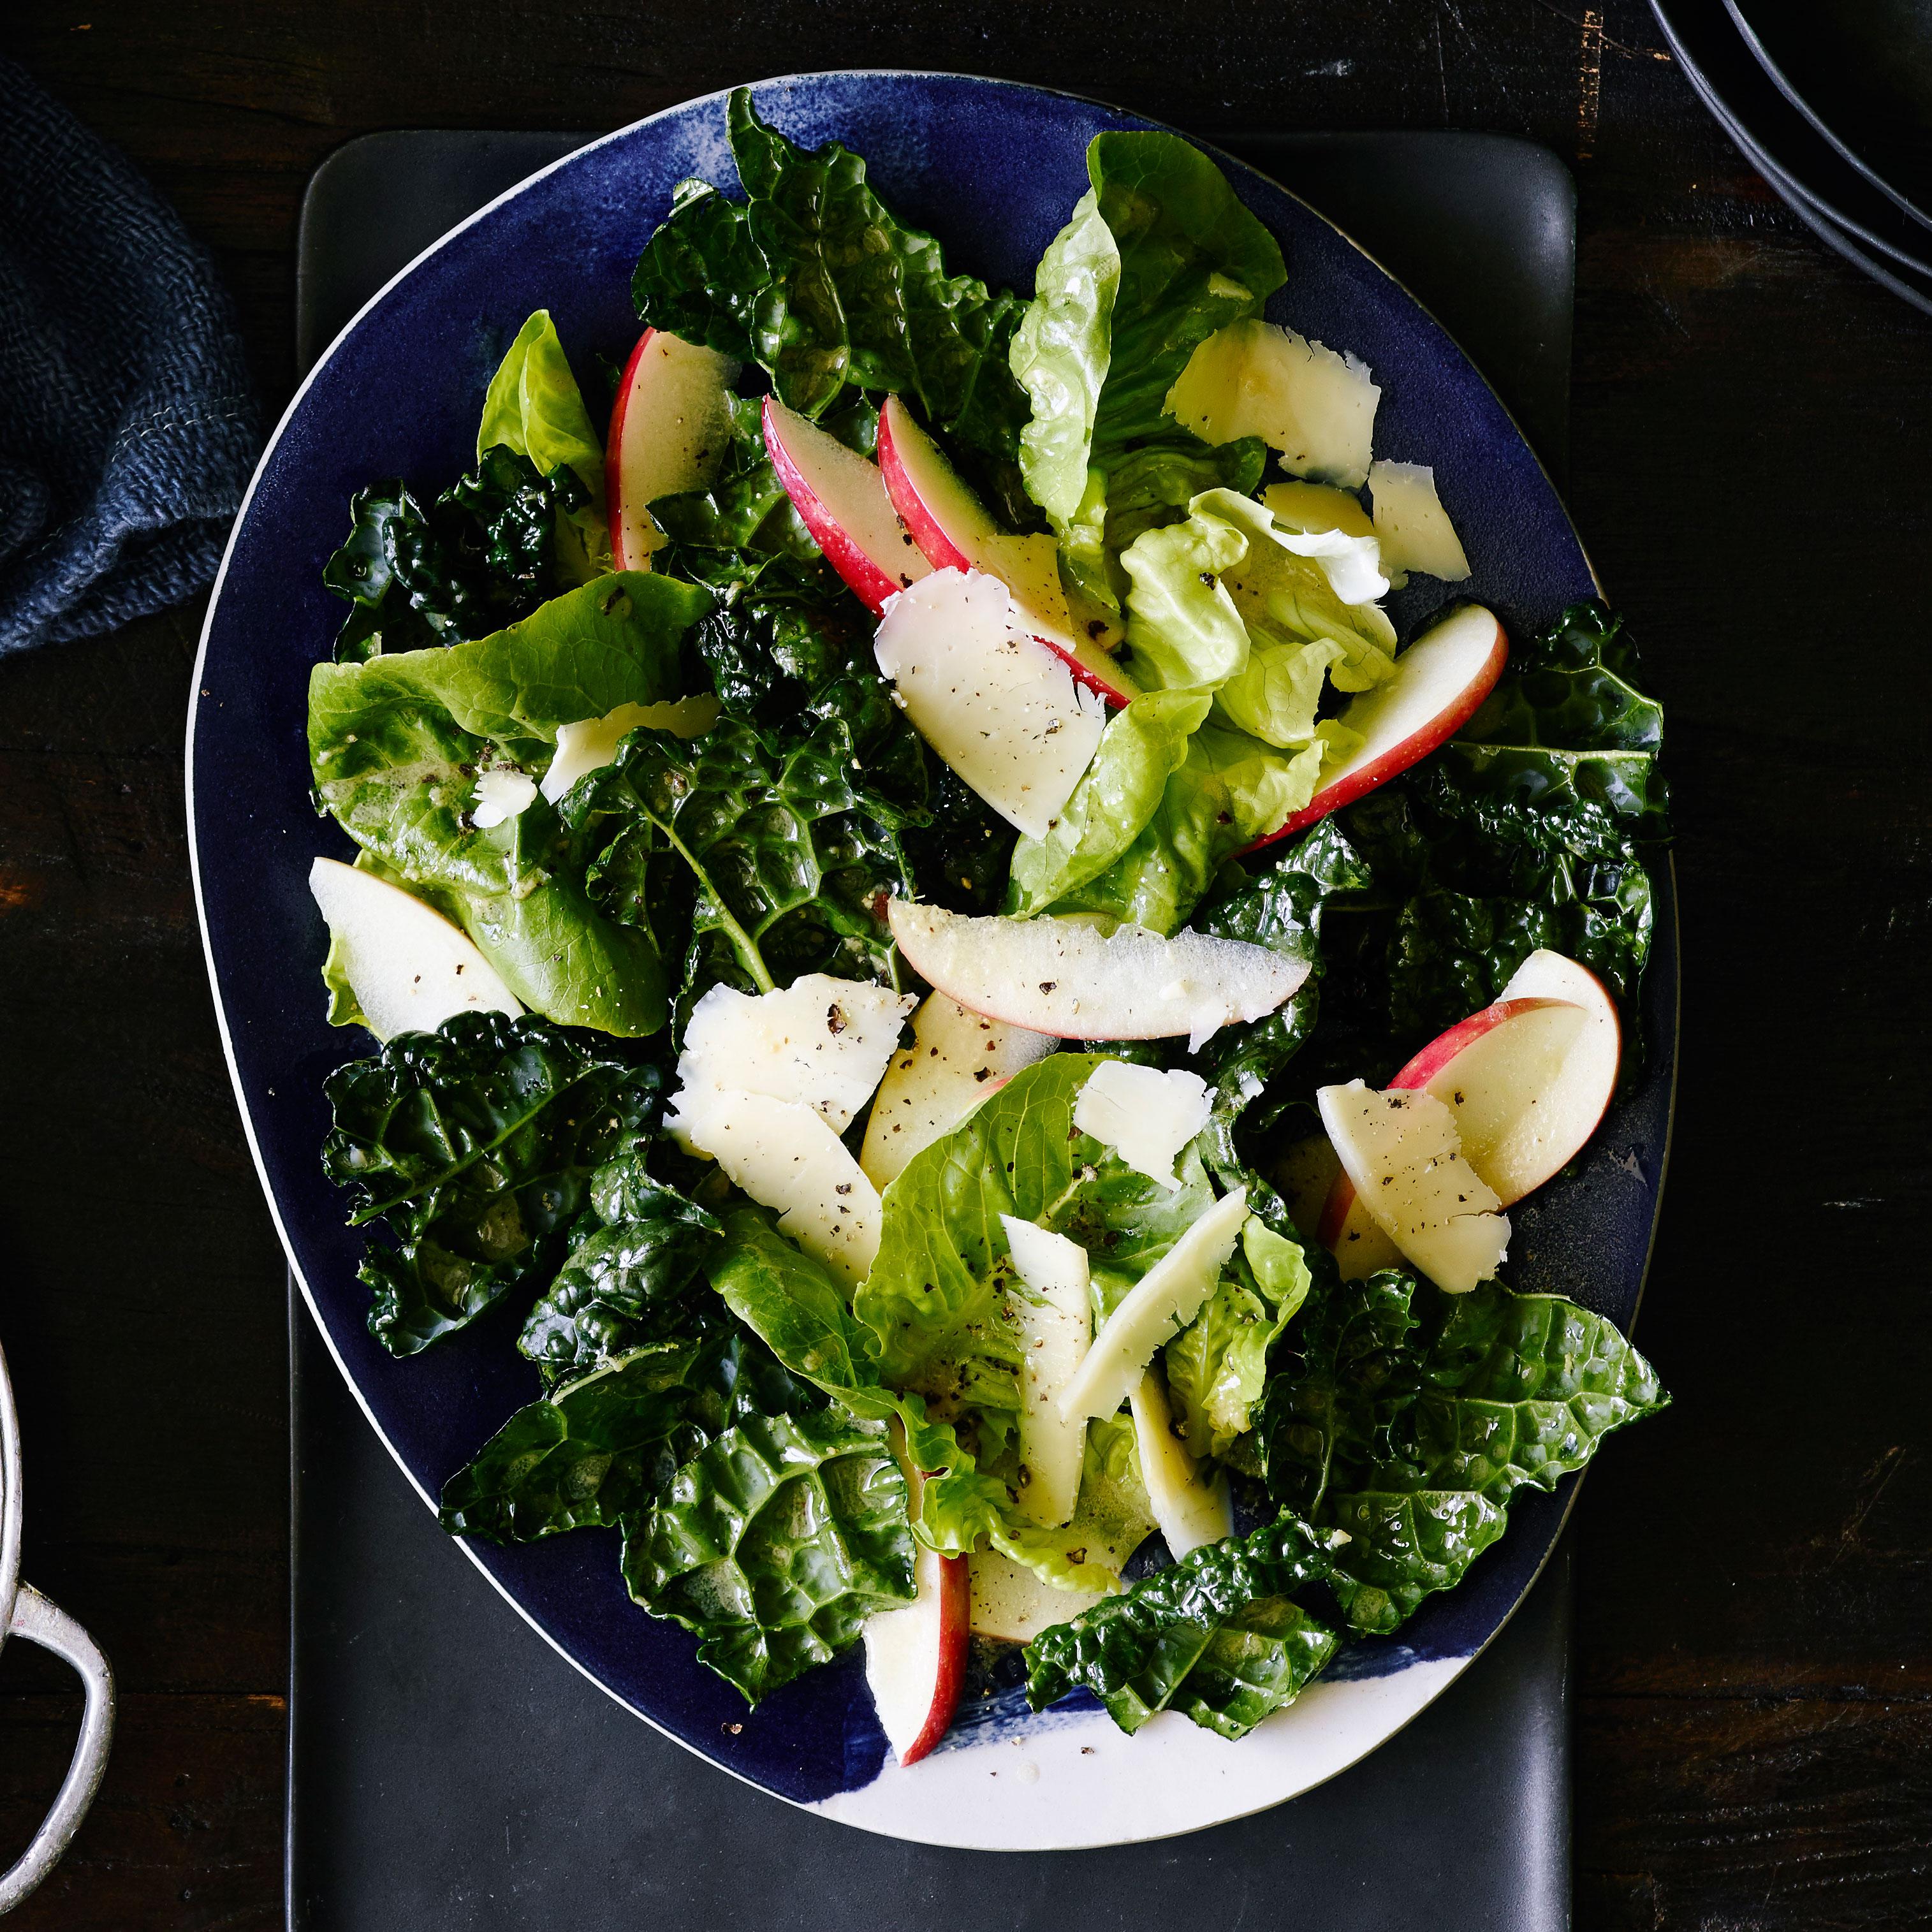 su-Fall Greens and Apple Salad Image